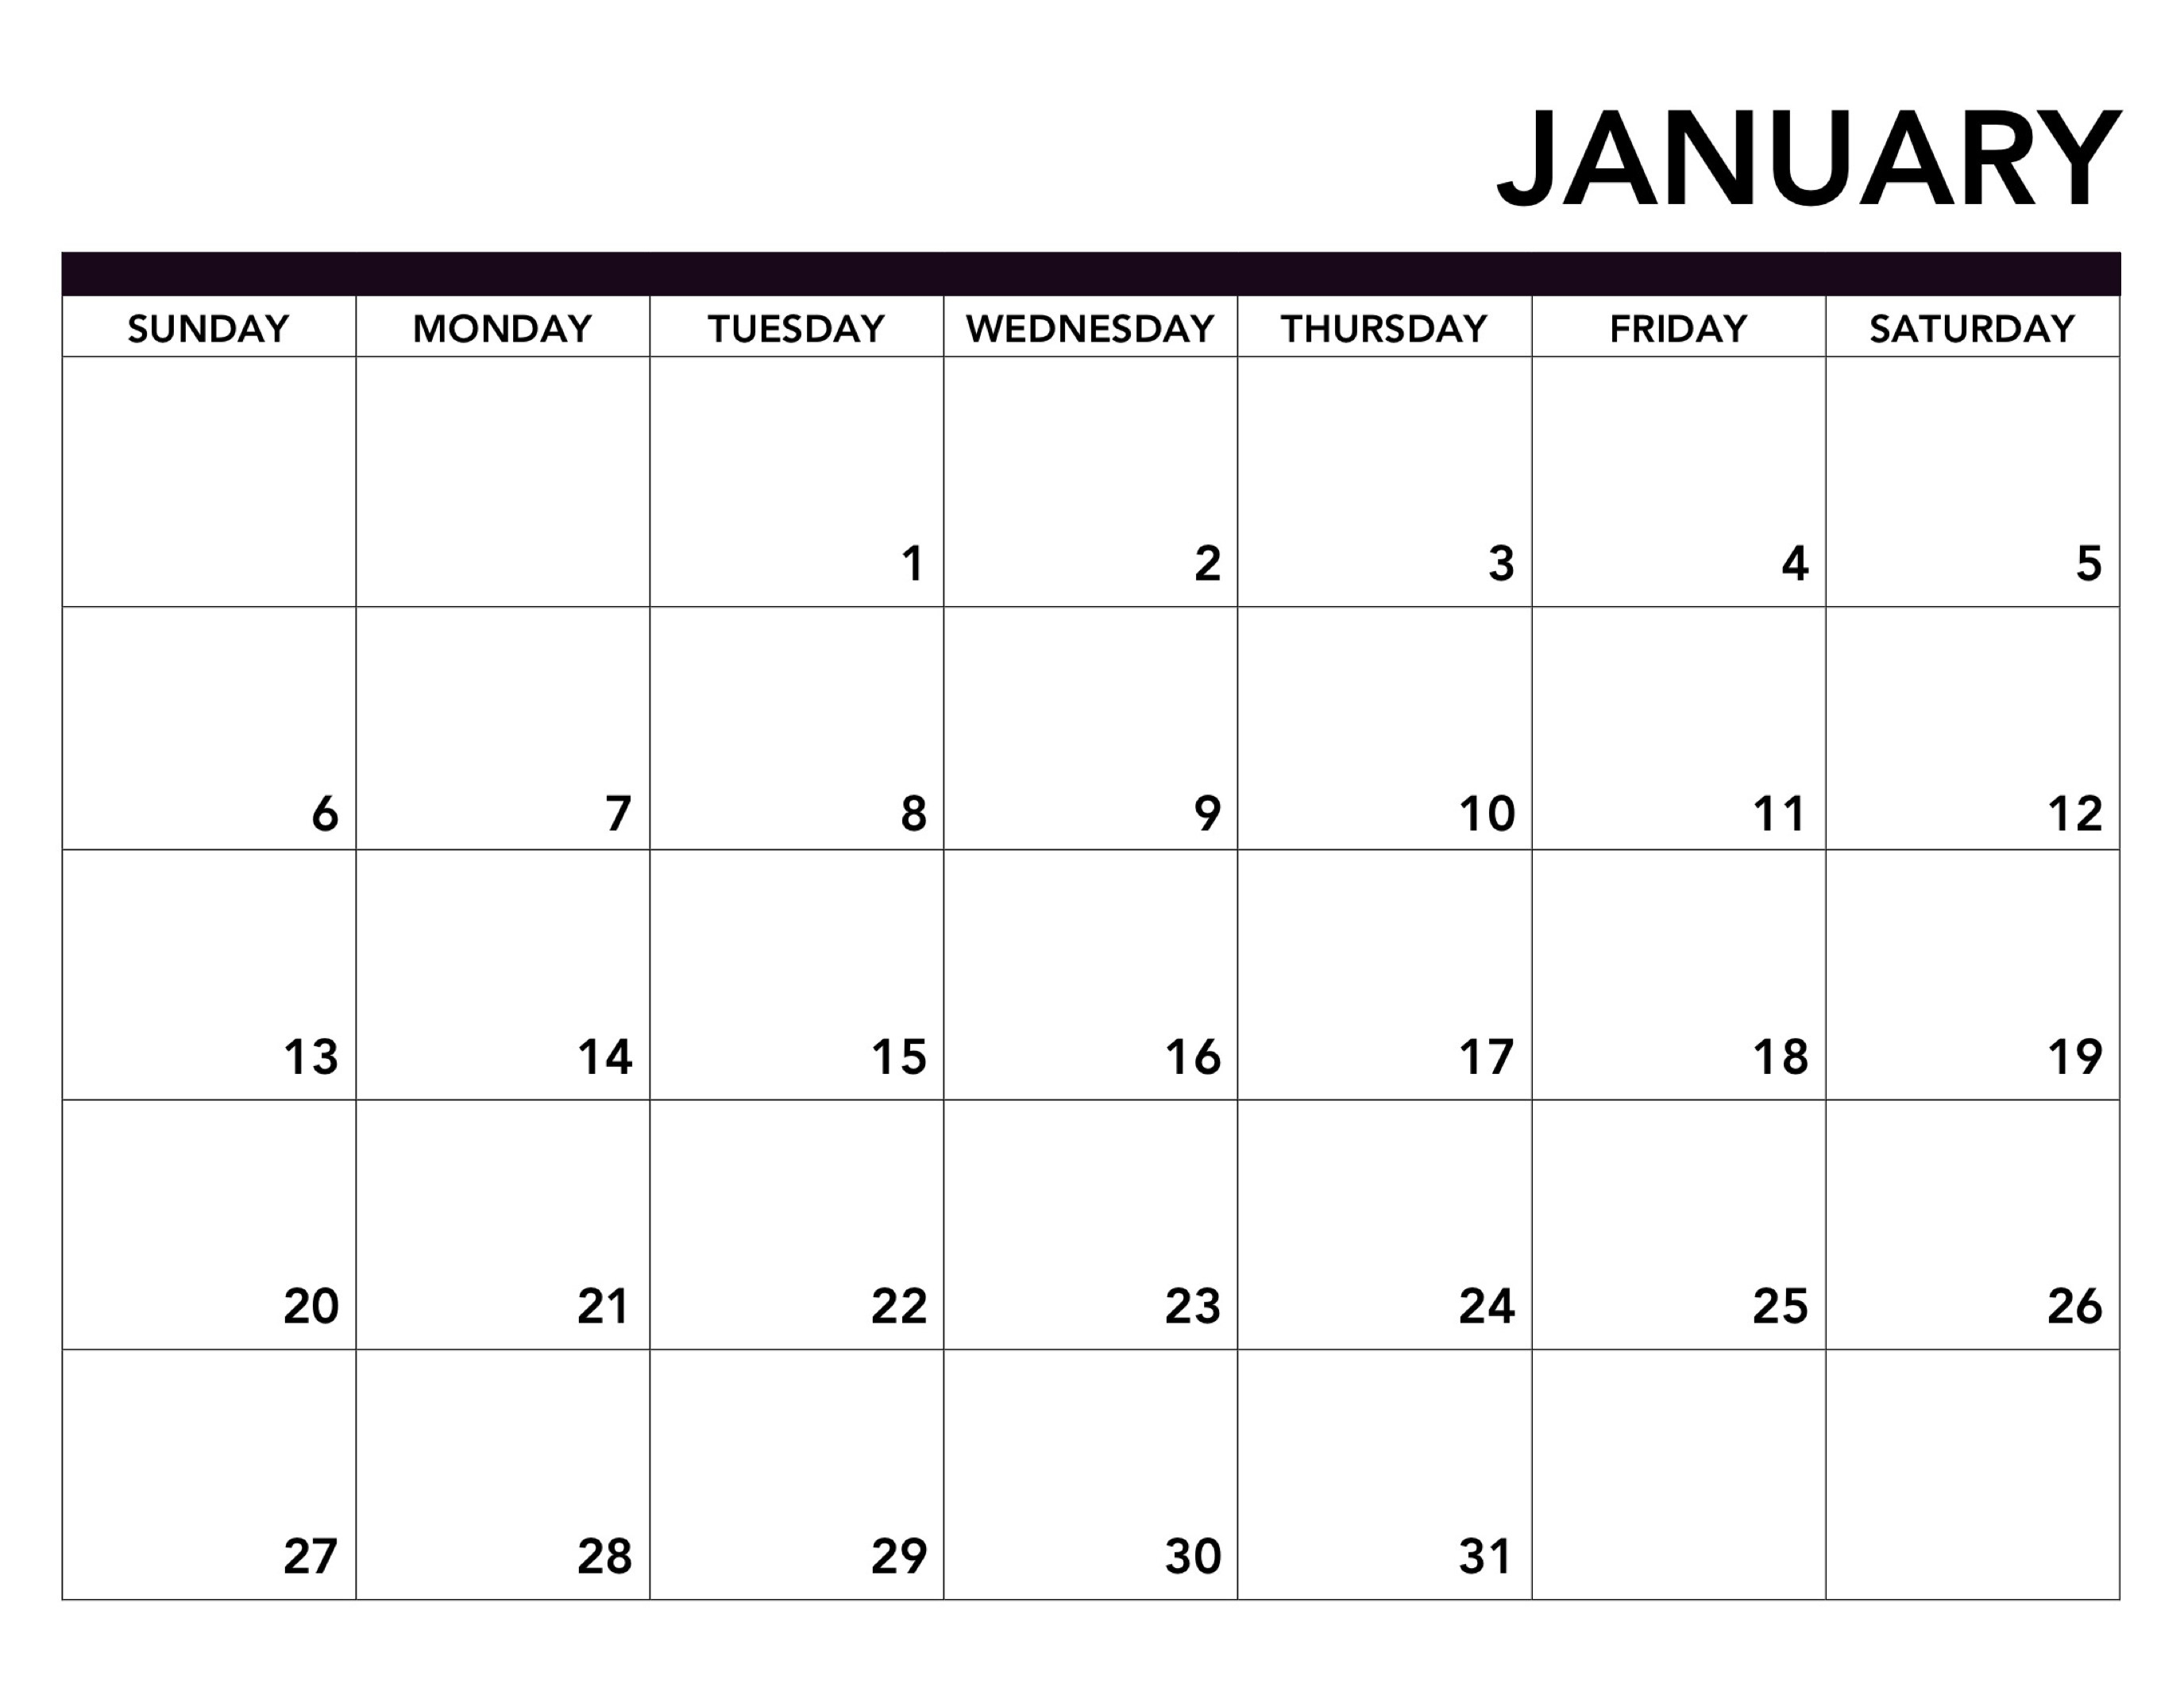 Printable Calendar July 2019 To June 2020 - Calendar Inspiration Design with Free Calendar July 2019-June 2020